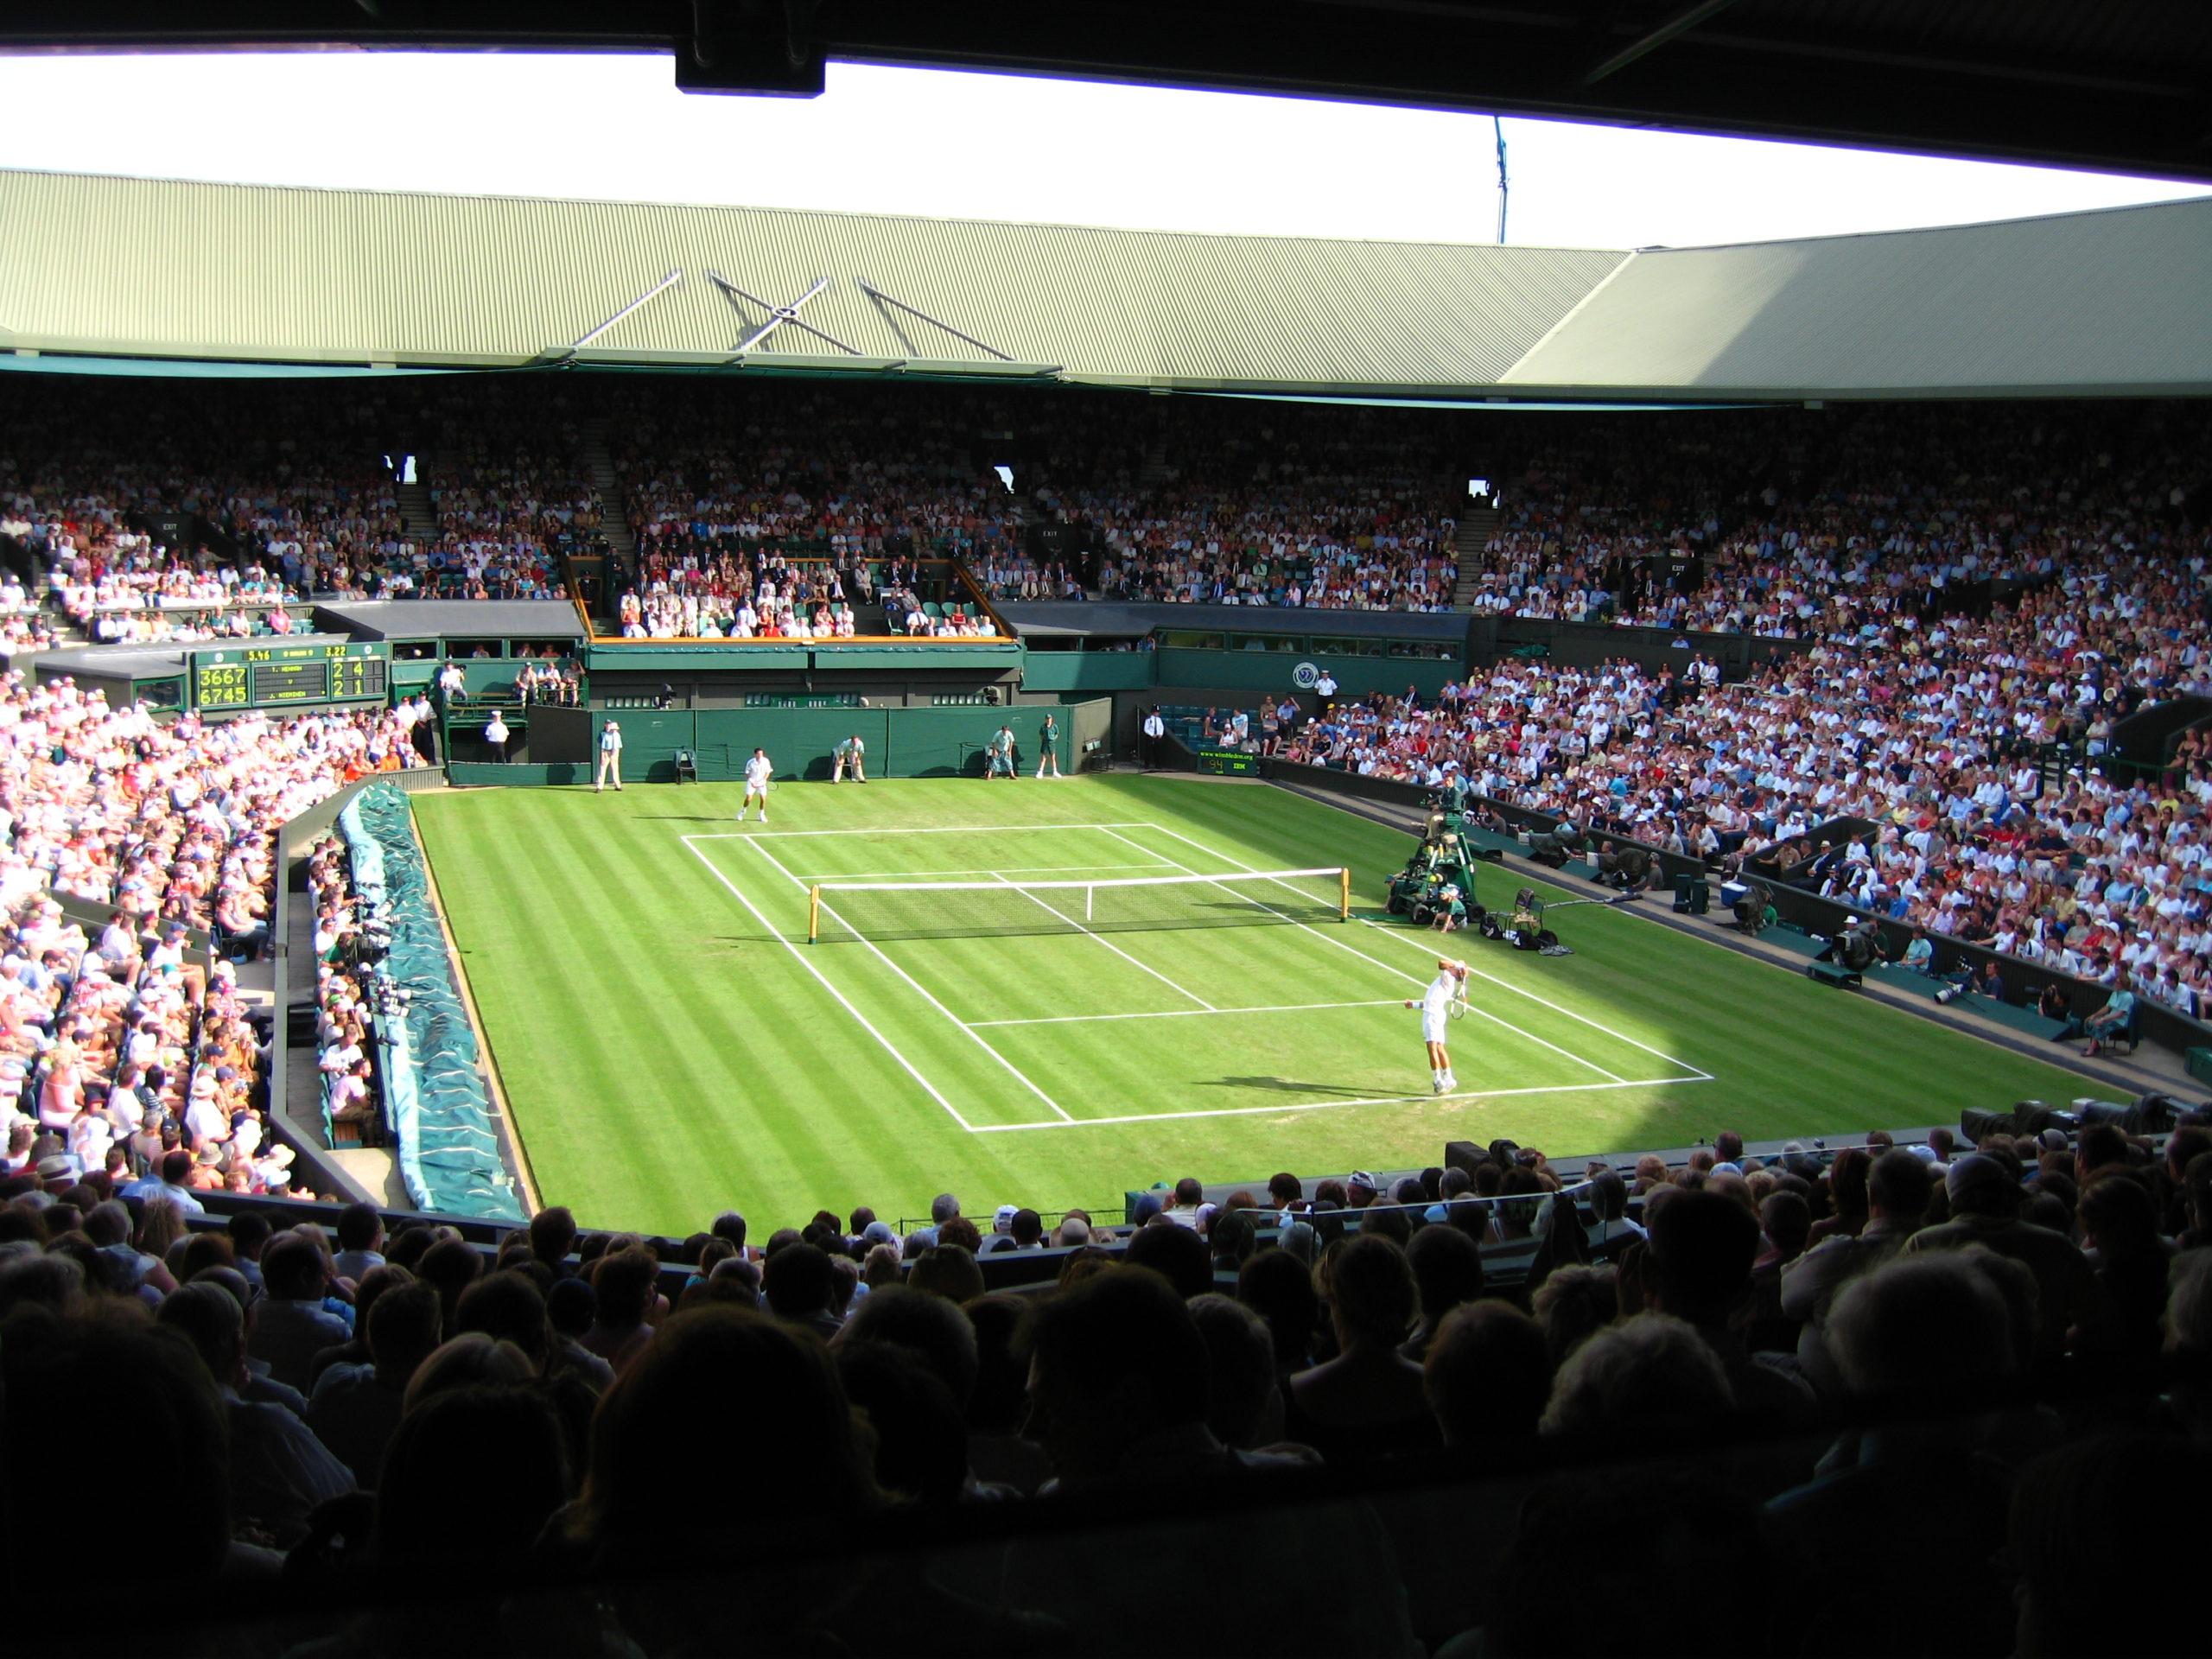 Tennisturneringen Wimbledon aflyst